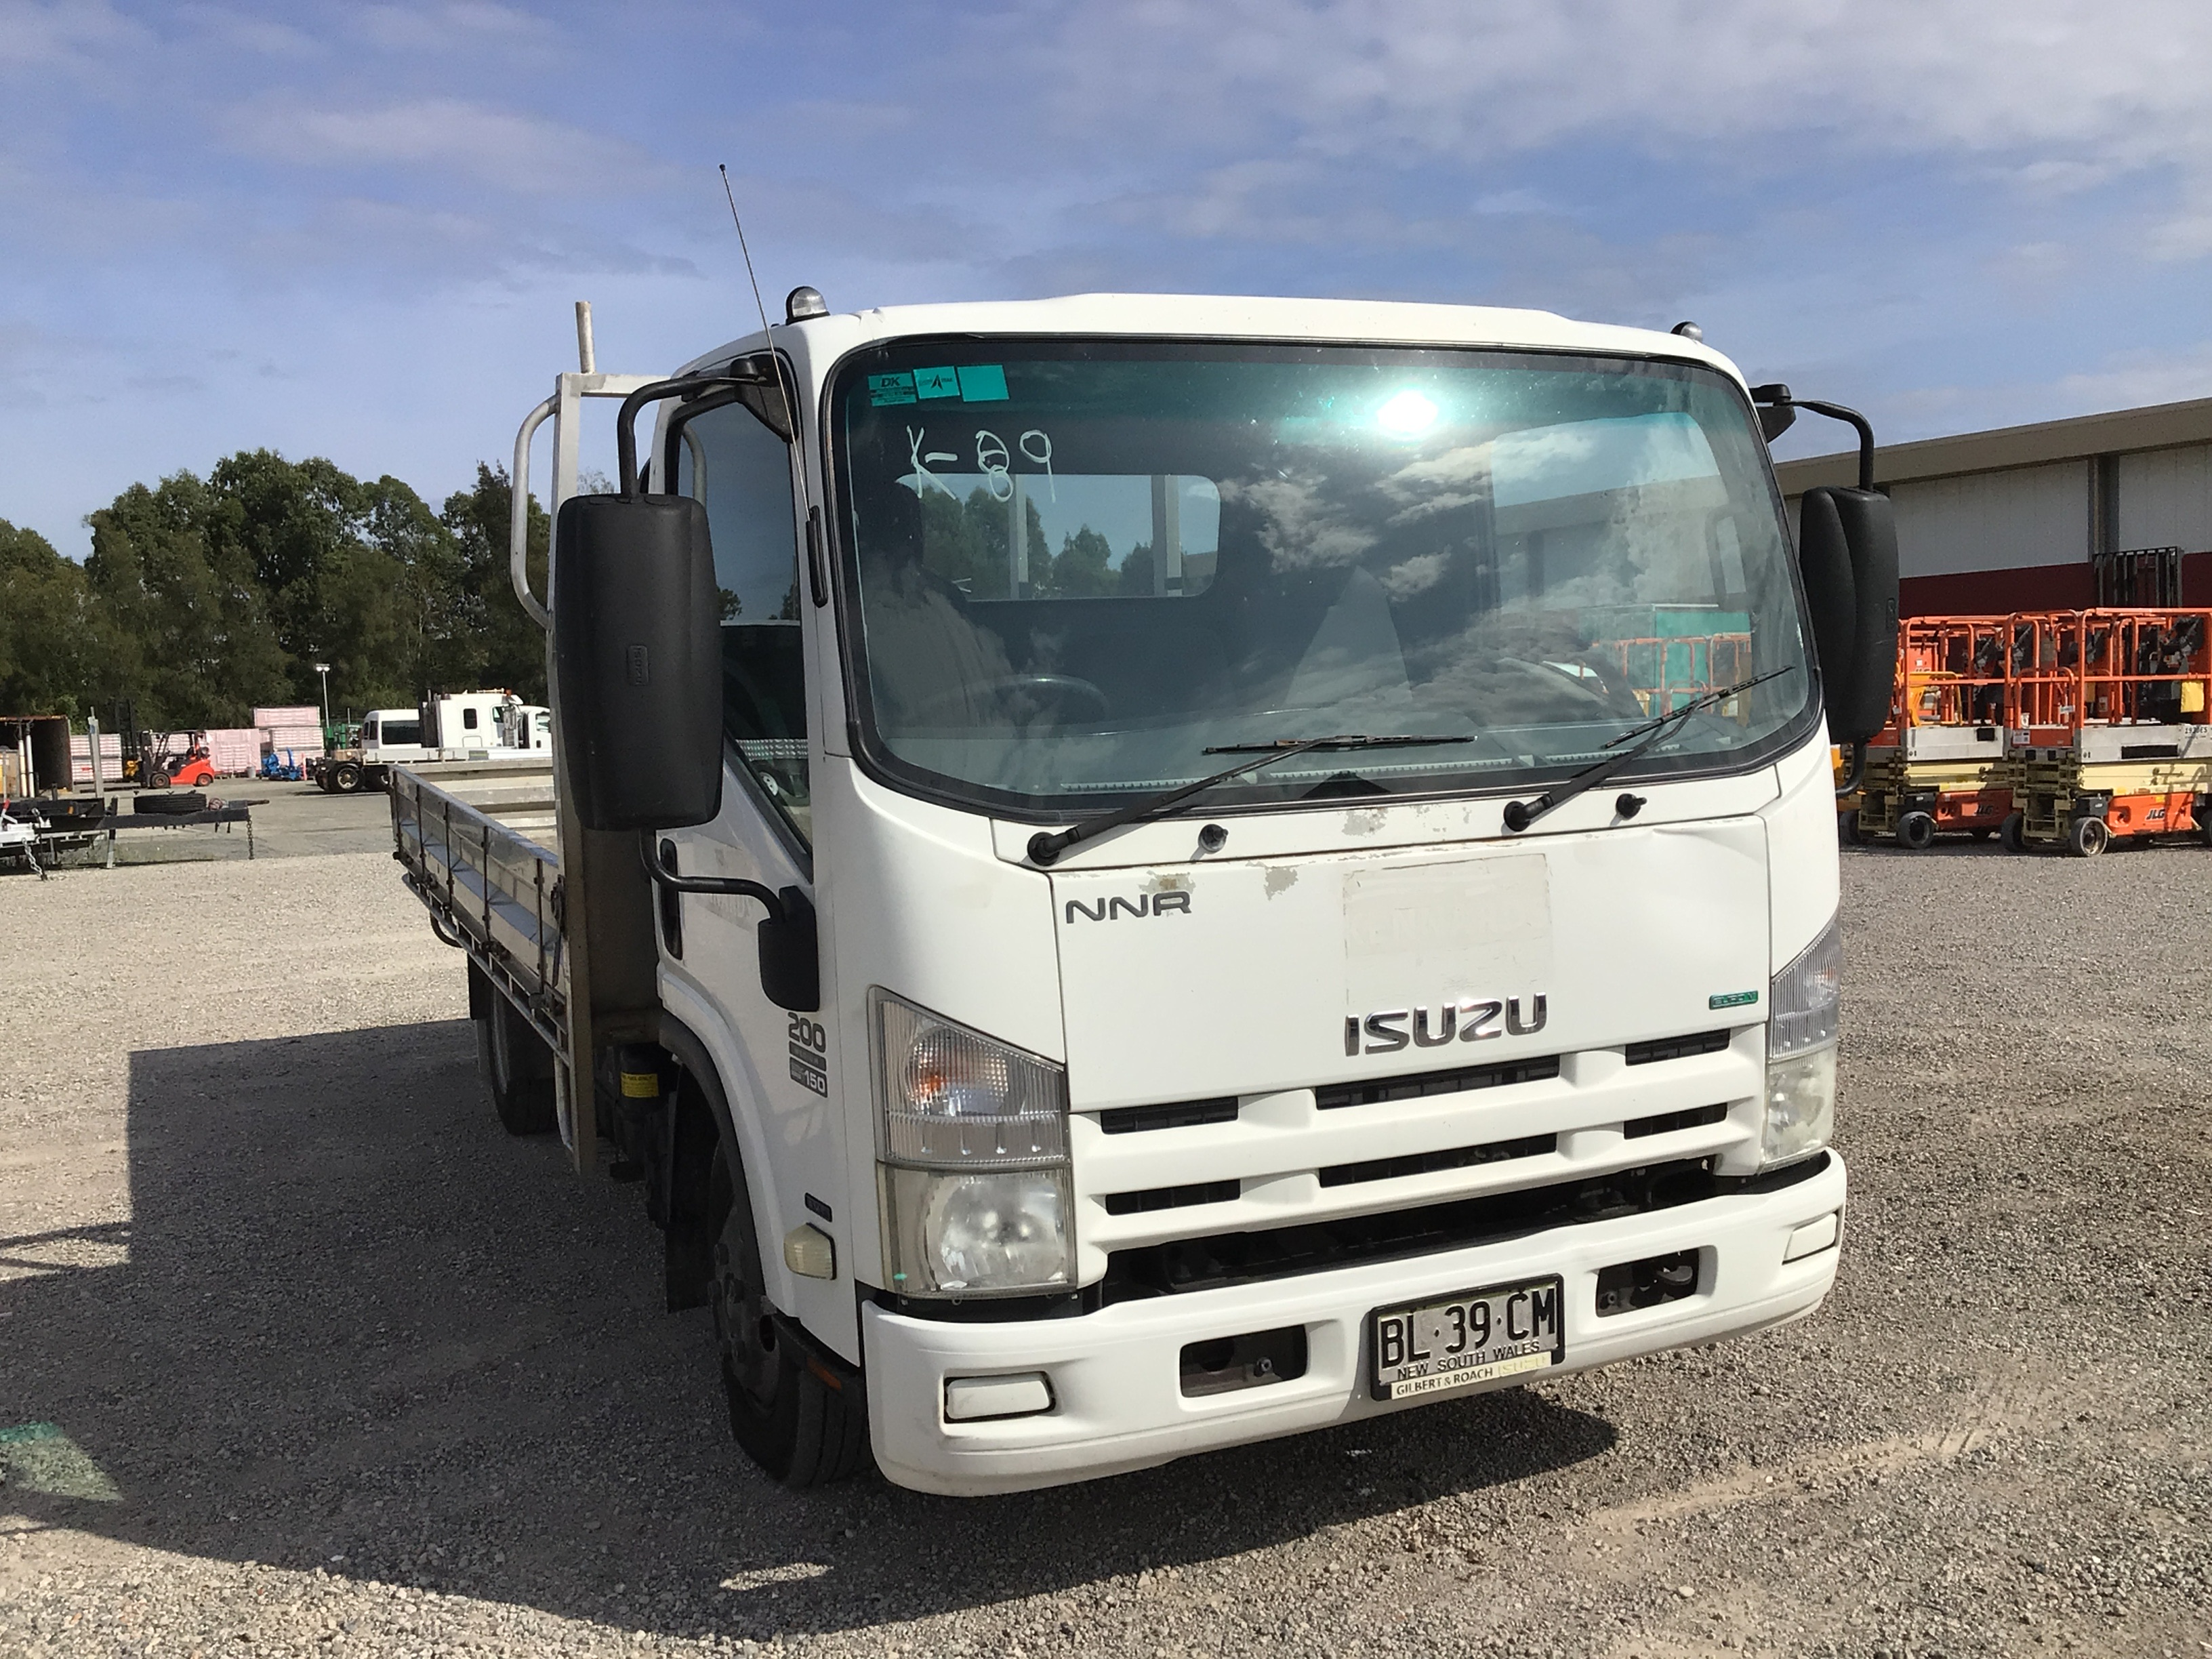 2011 Isuzu NNR 200 Medium 4 x 2 Tray Body Truck